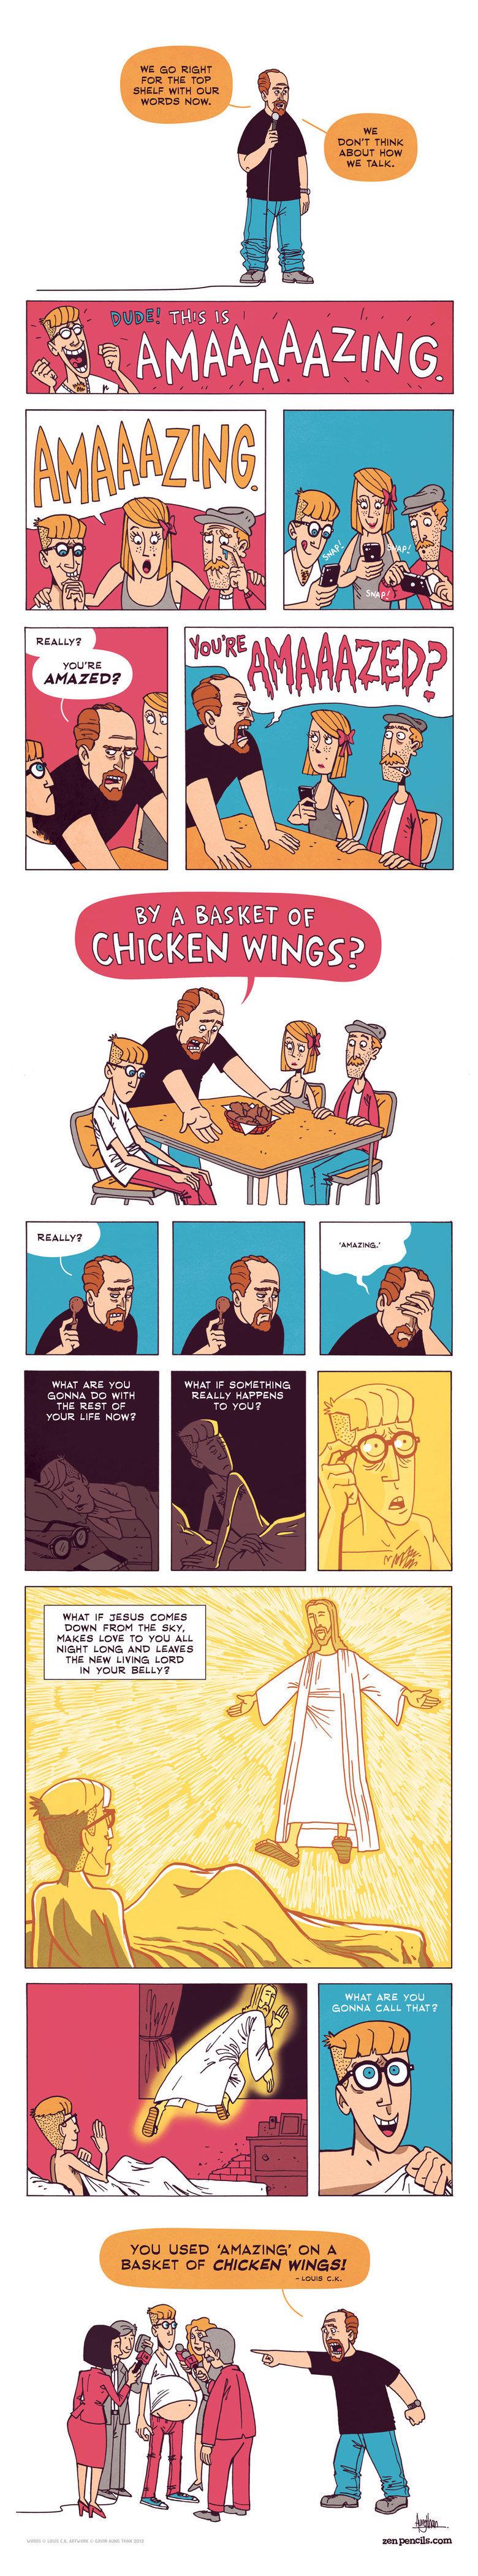 this comic is amazing. .